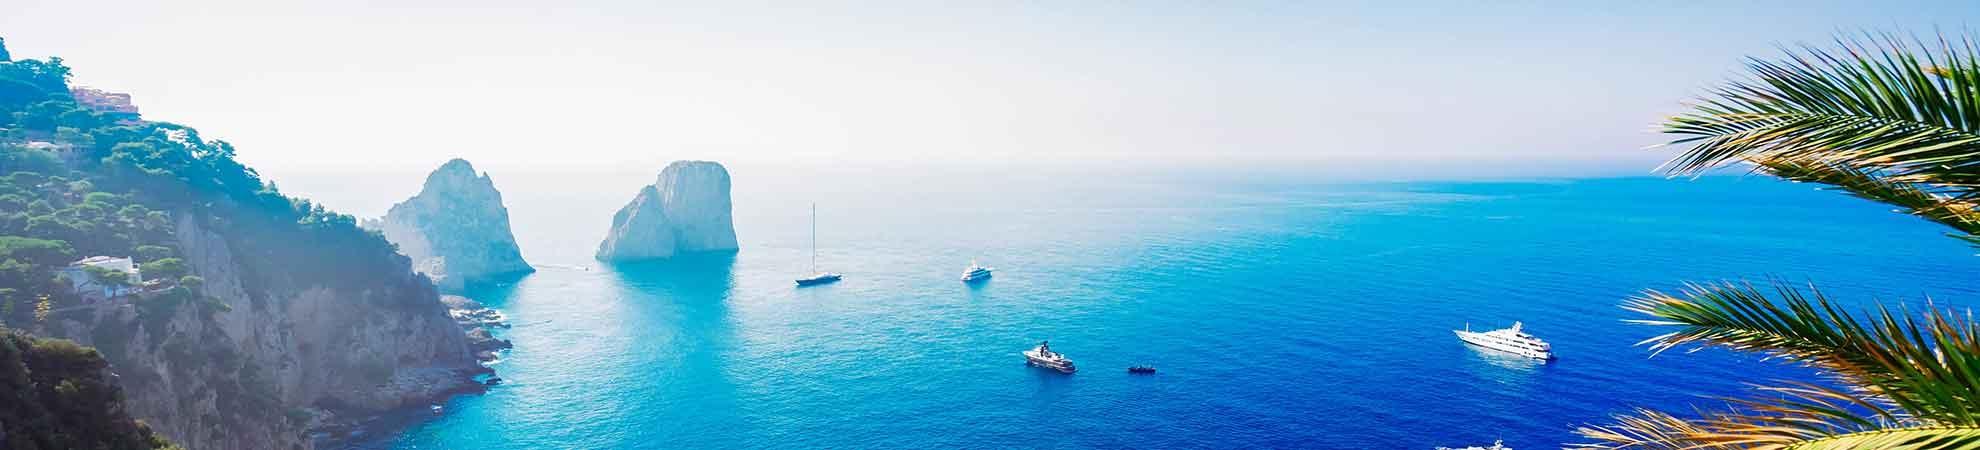 Voyage Capri